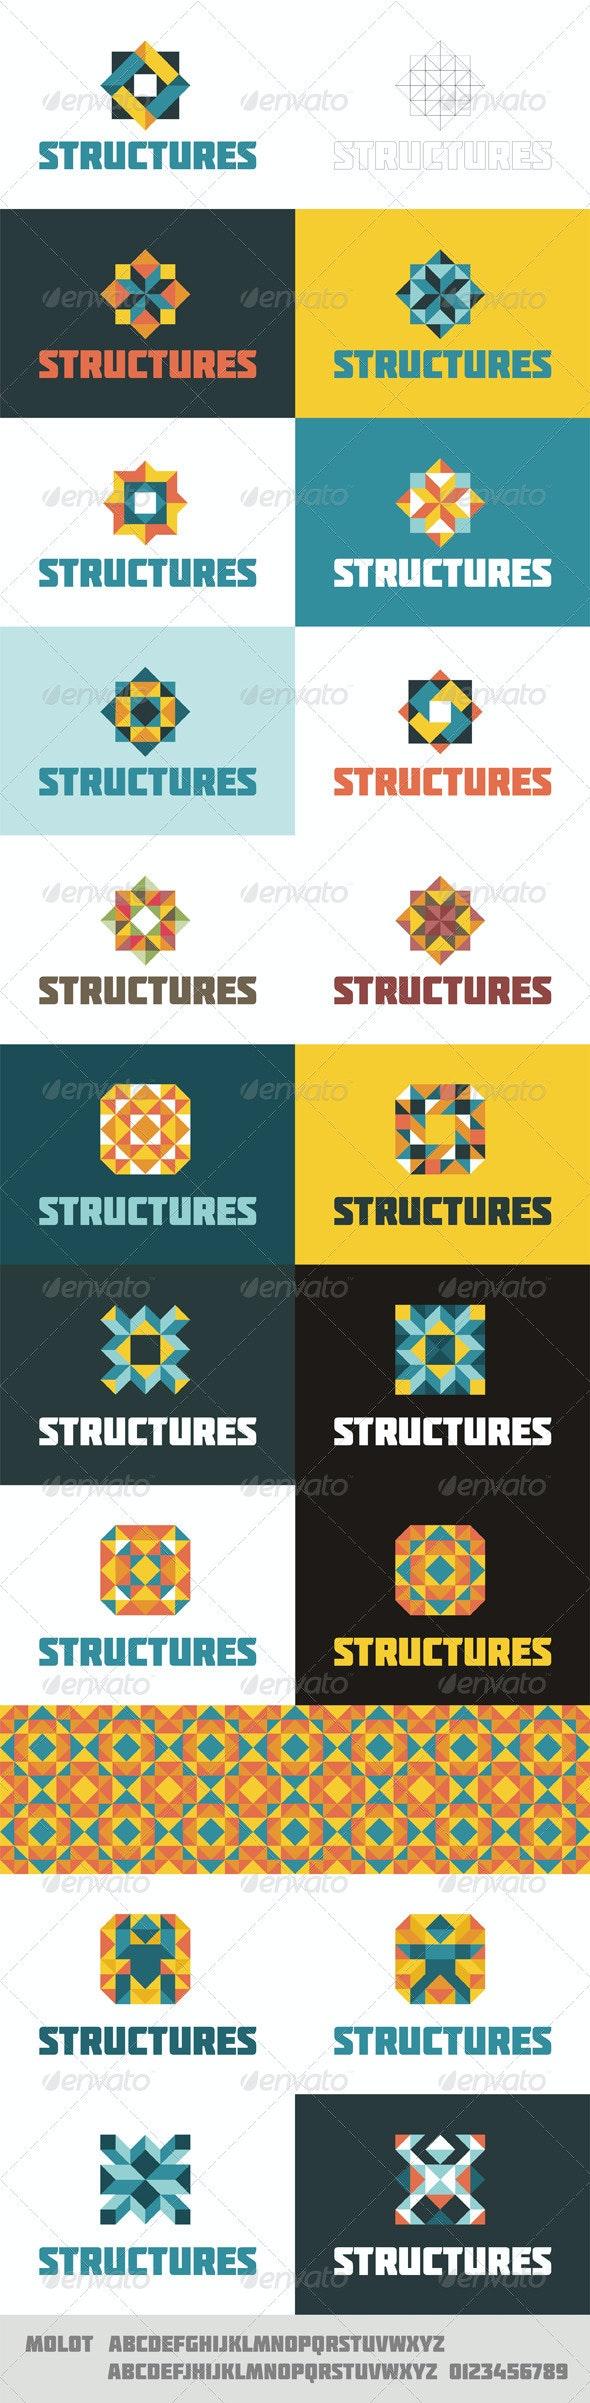 Structures Logo Concept - Abstract Logo Templates